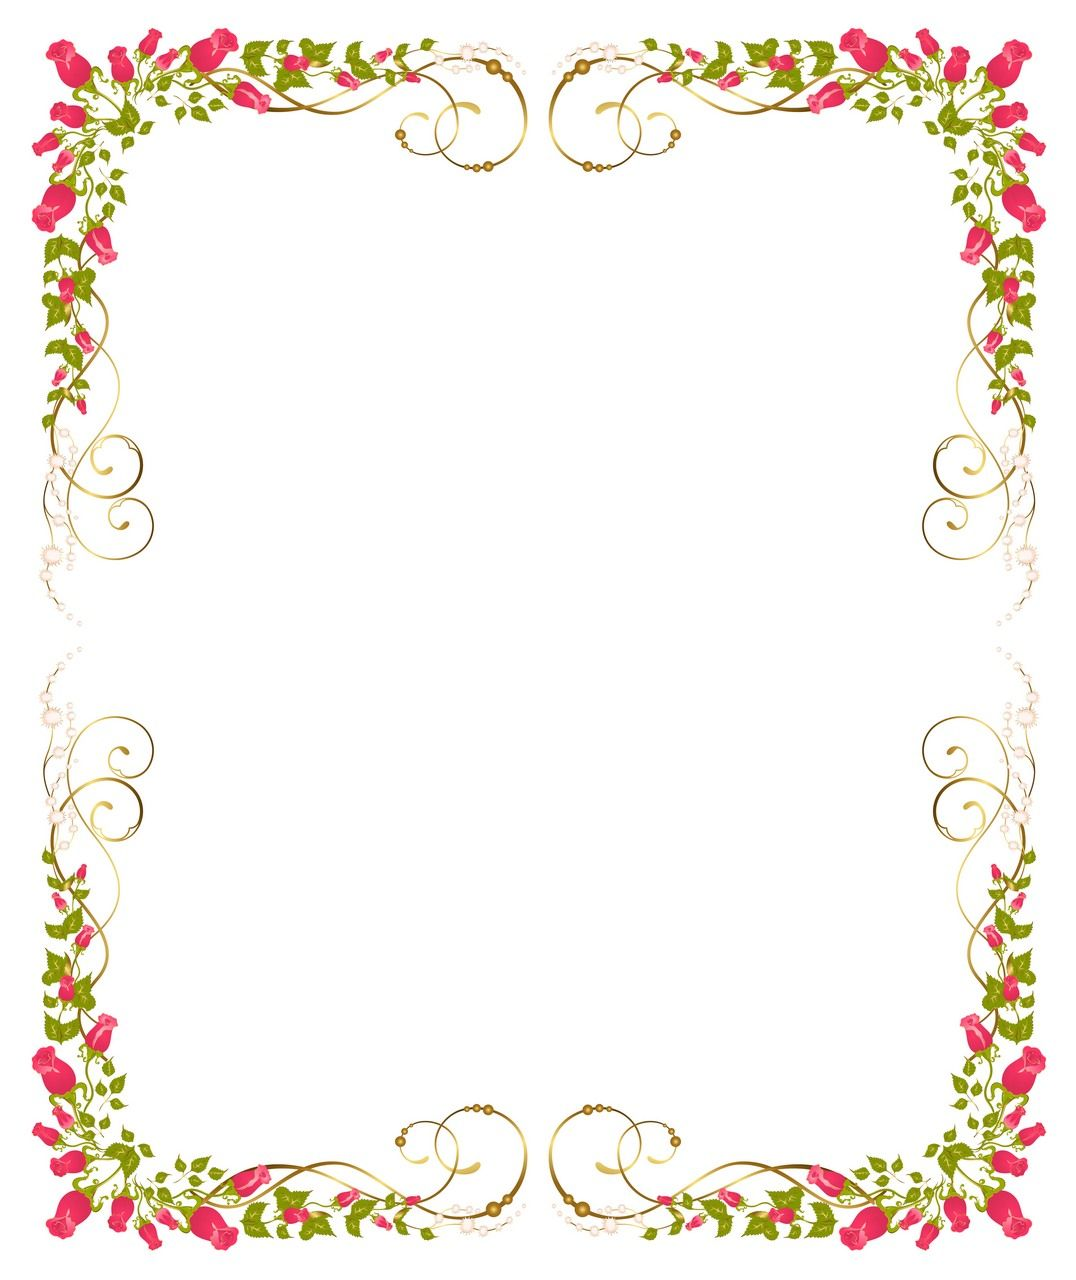 flower background frame 09 vector eps free download logo icons brand emblems [ 1076 x 1280 Pixel ]